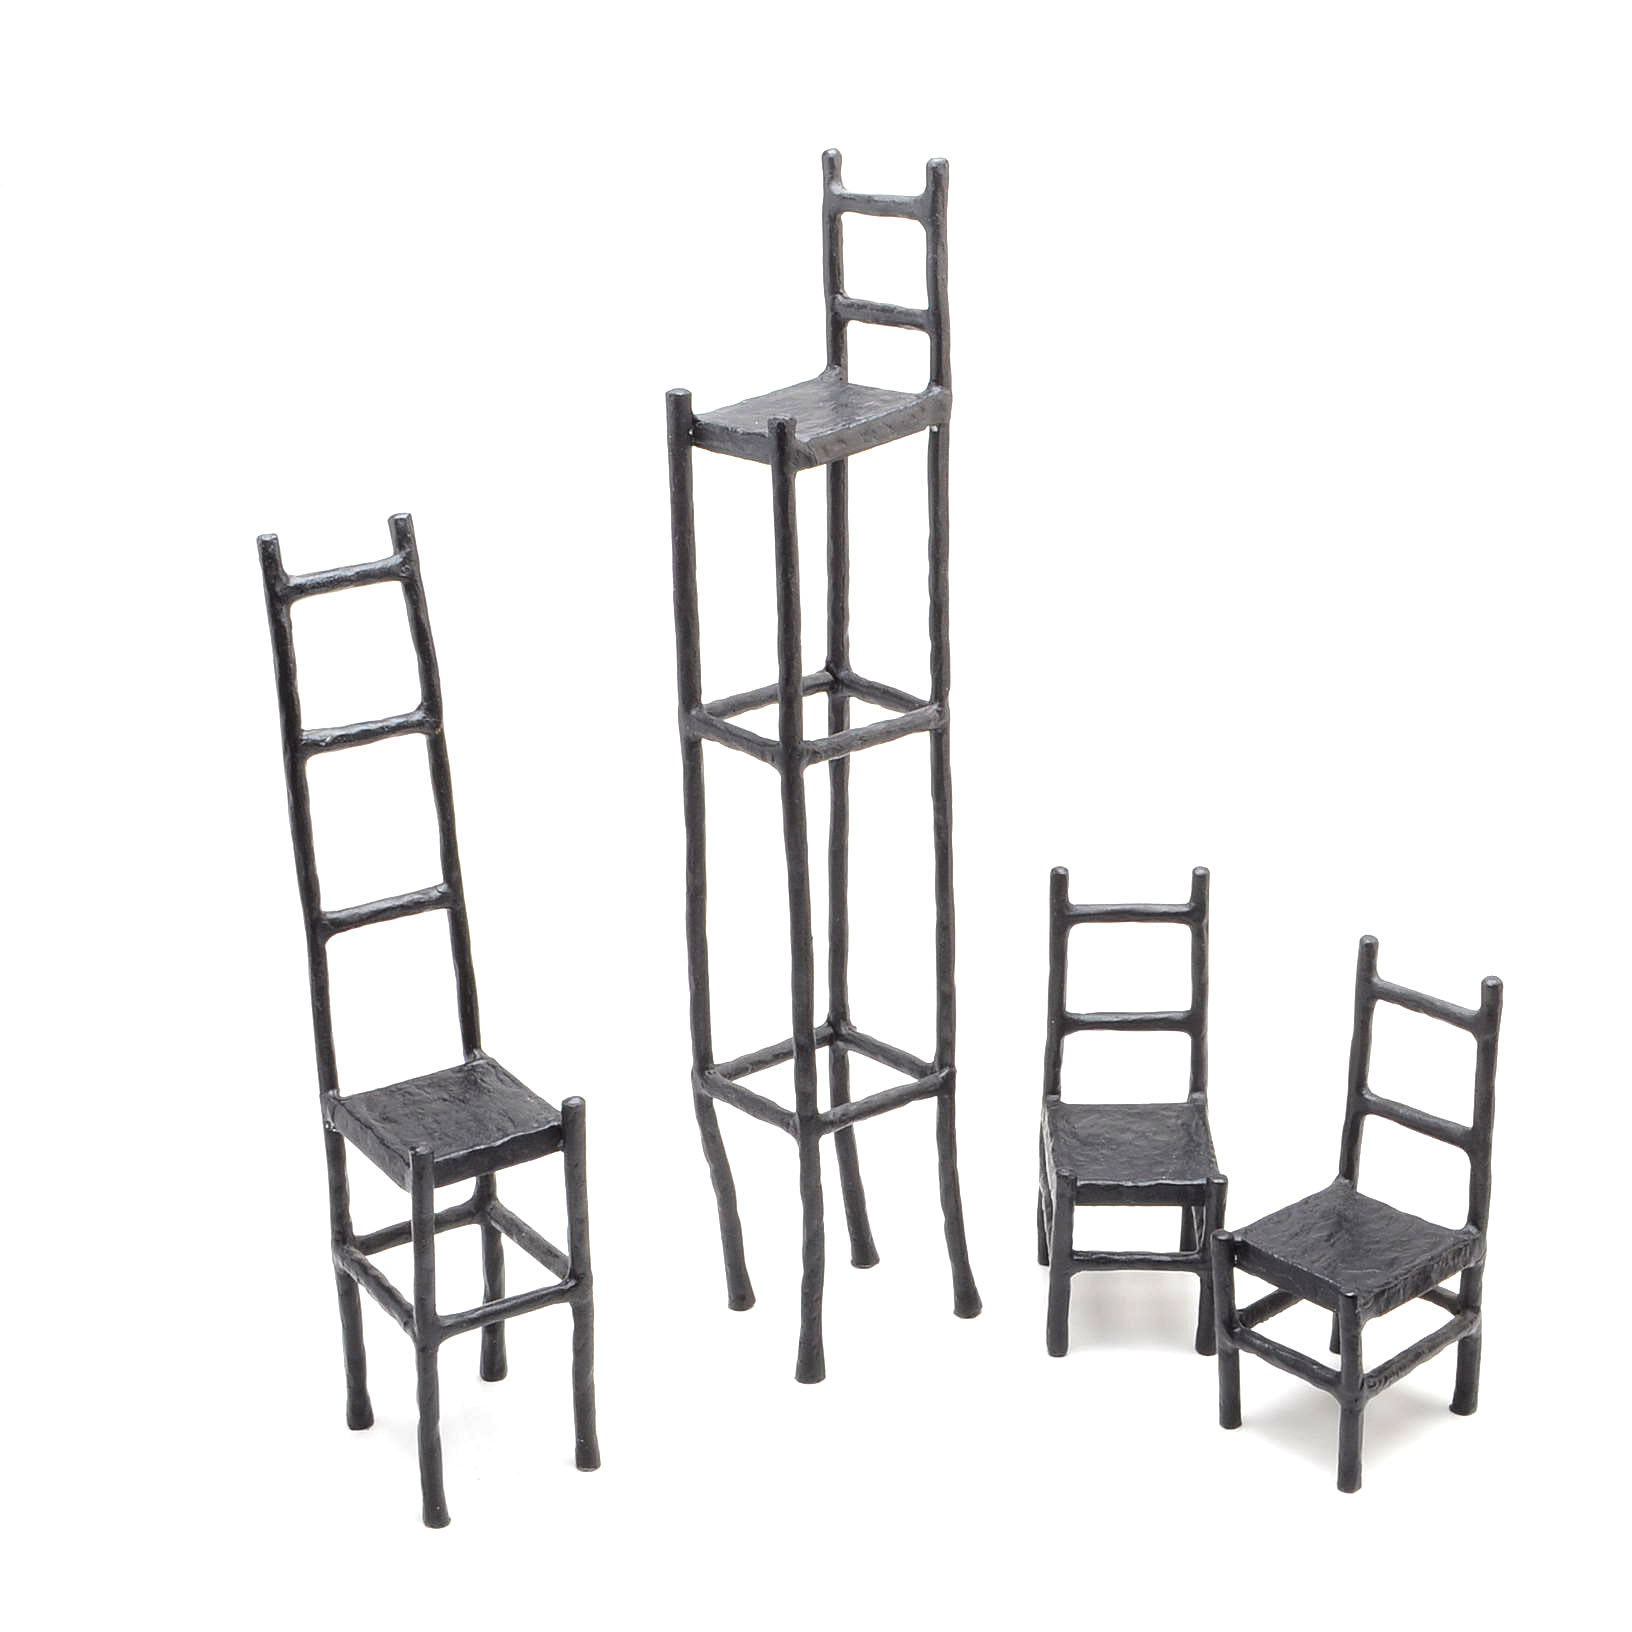 Decorative Cast Iron Chairs